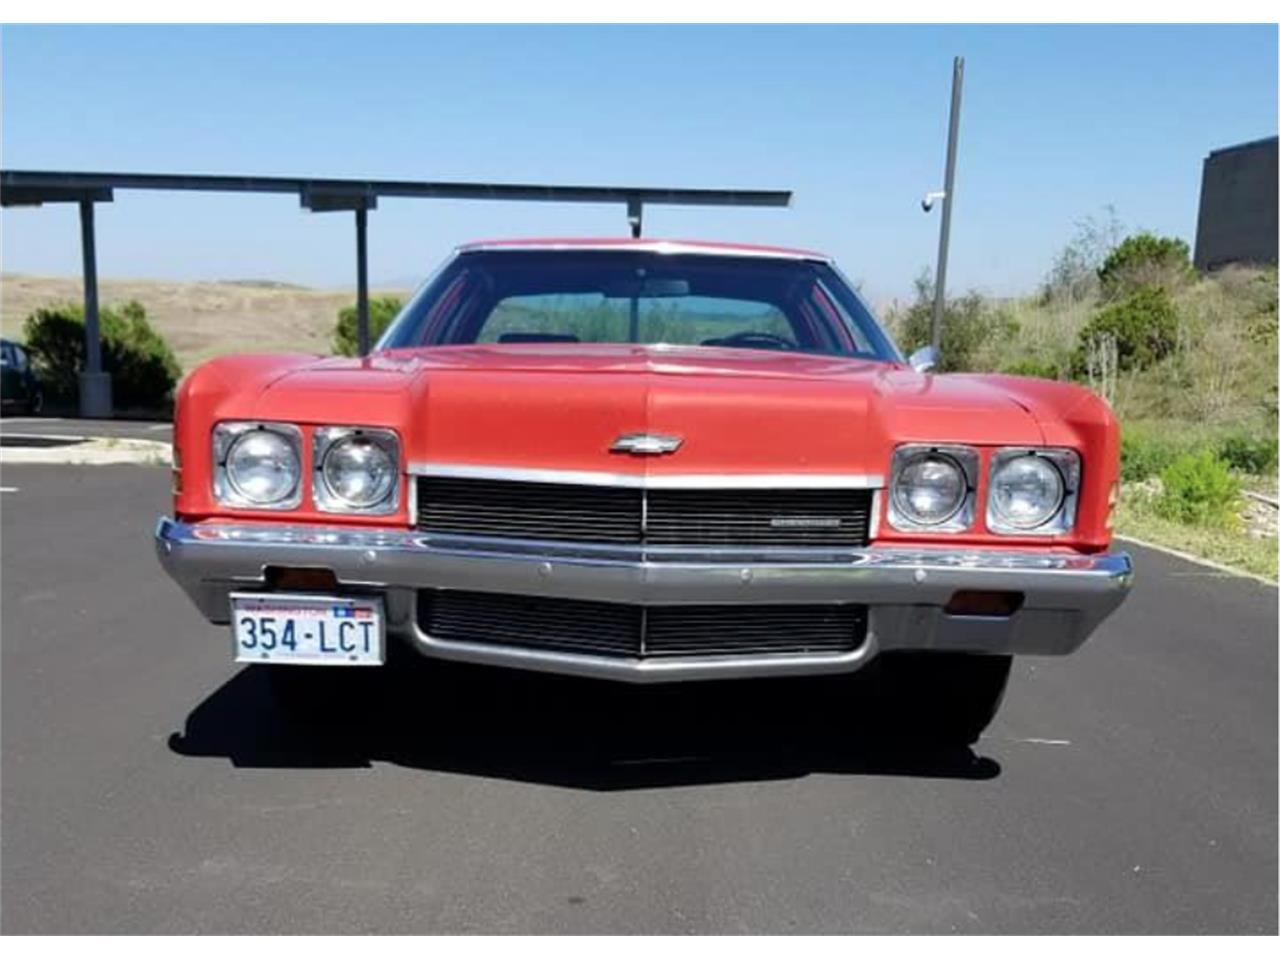 1972 Chevrolet Impala (CC-1302240) for sale in Rapid City, Michigan